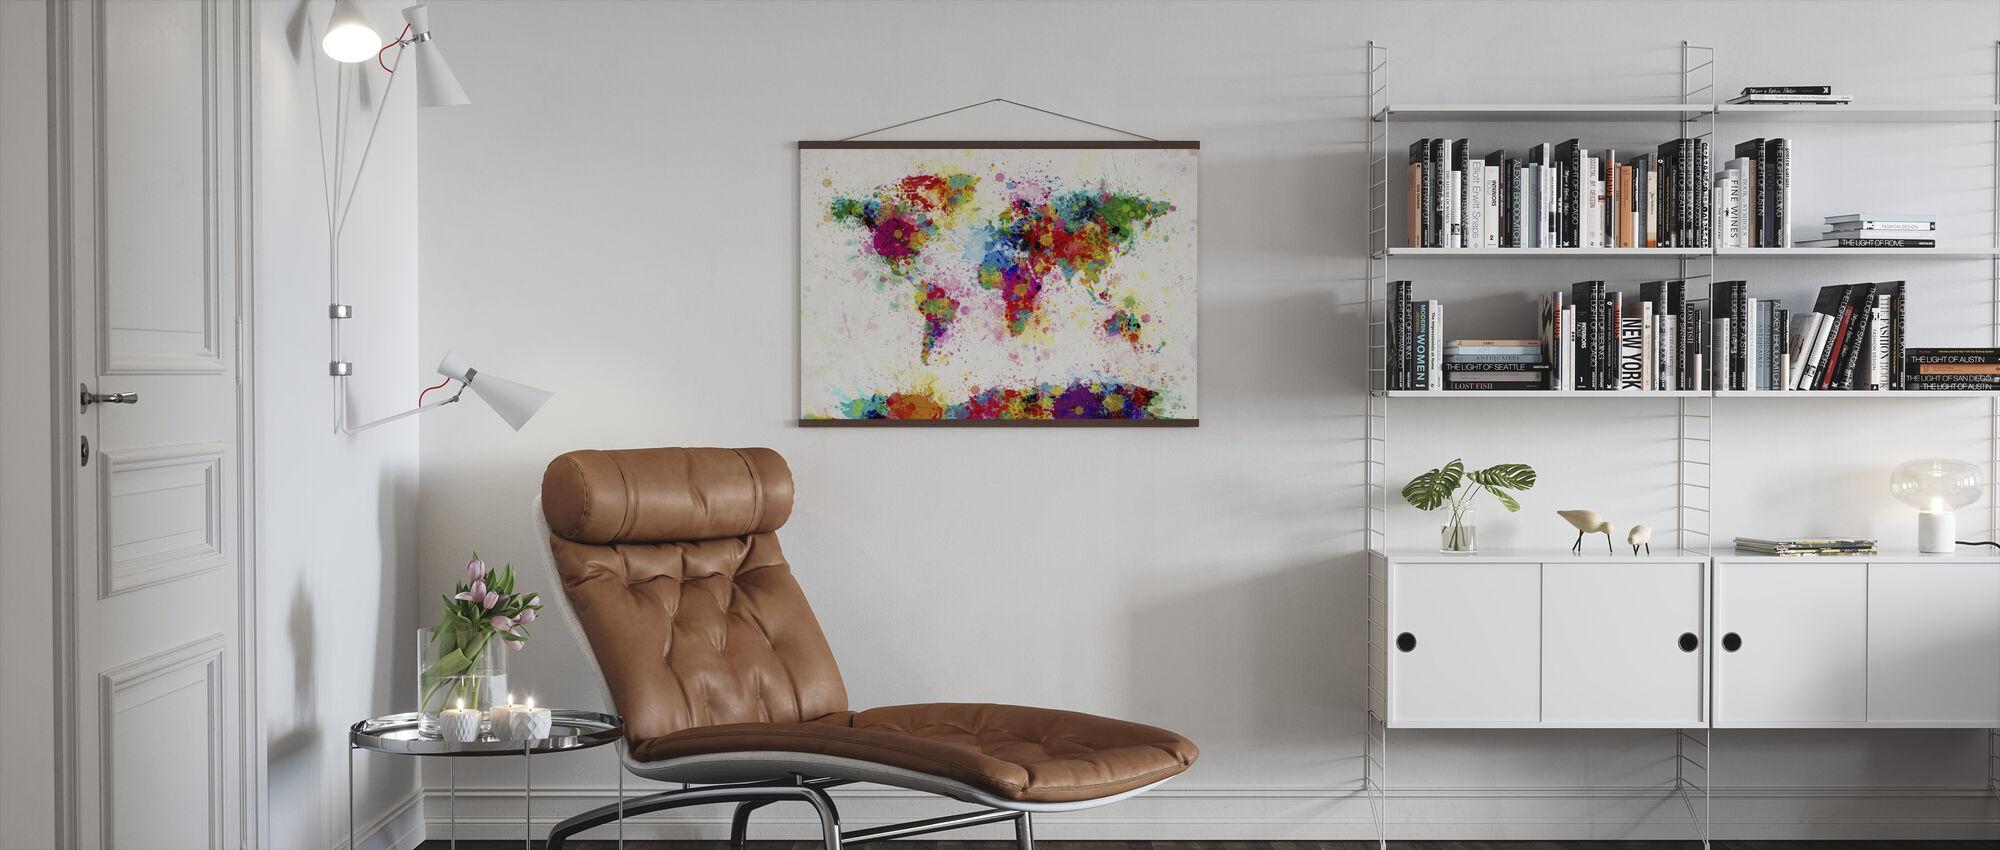 Paint Splashes Kort - Plakat - Stue